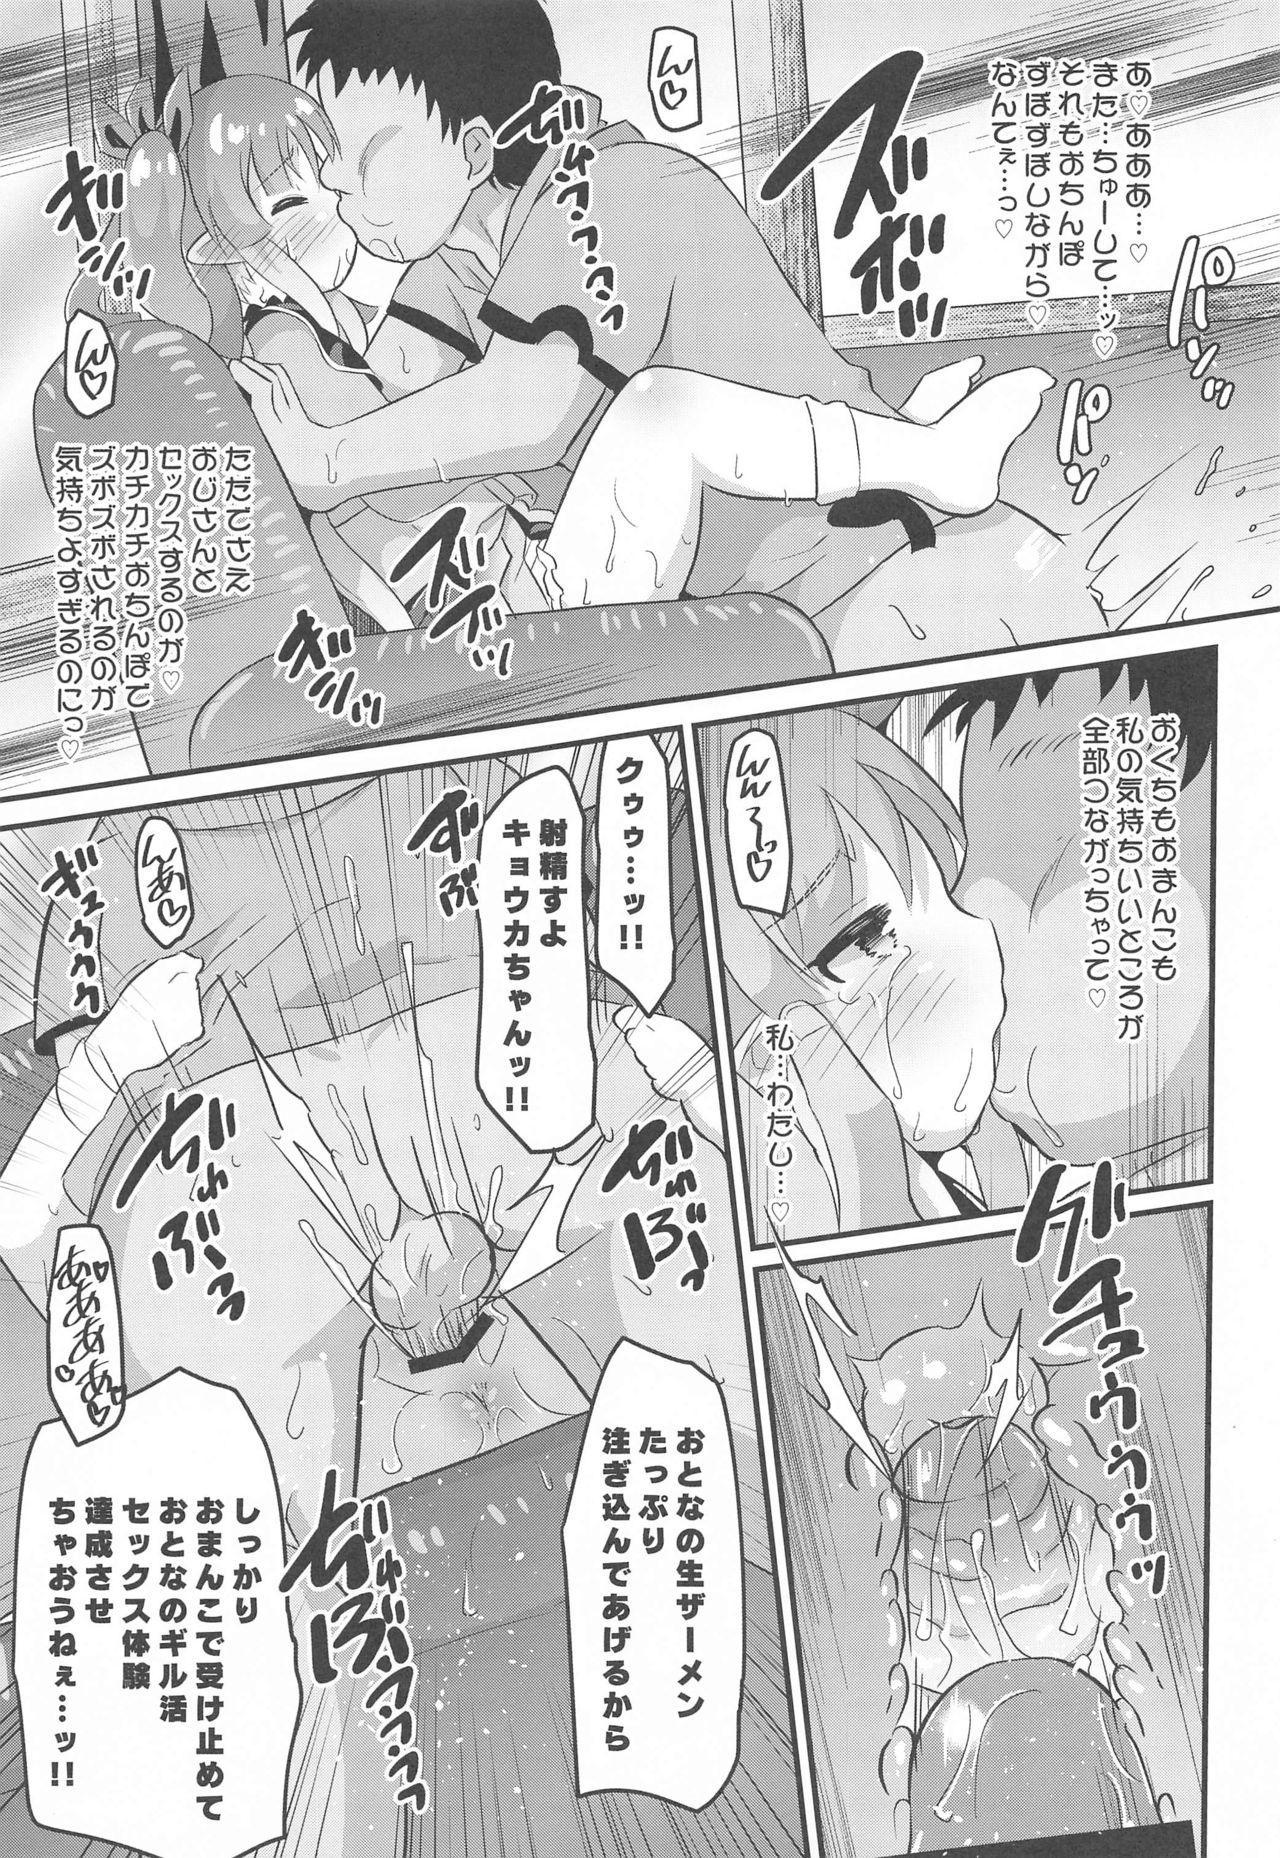 Kyouka-chan to Otona no Guild Katsudou 13